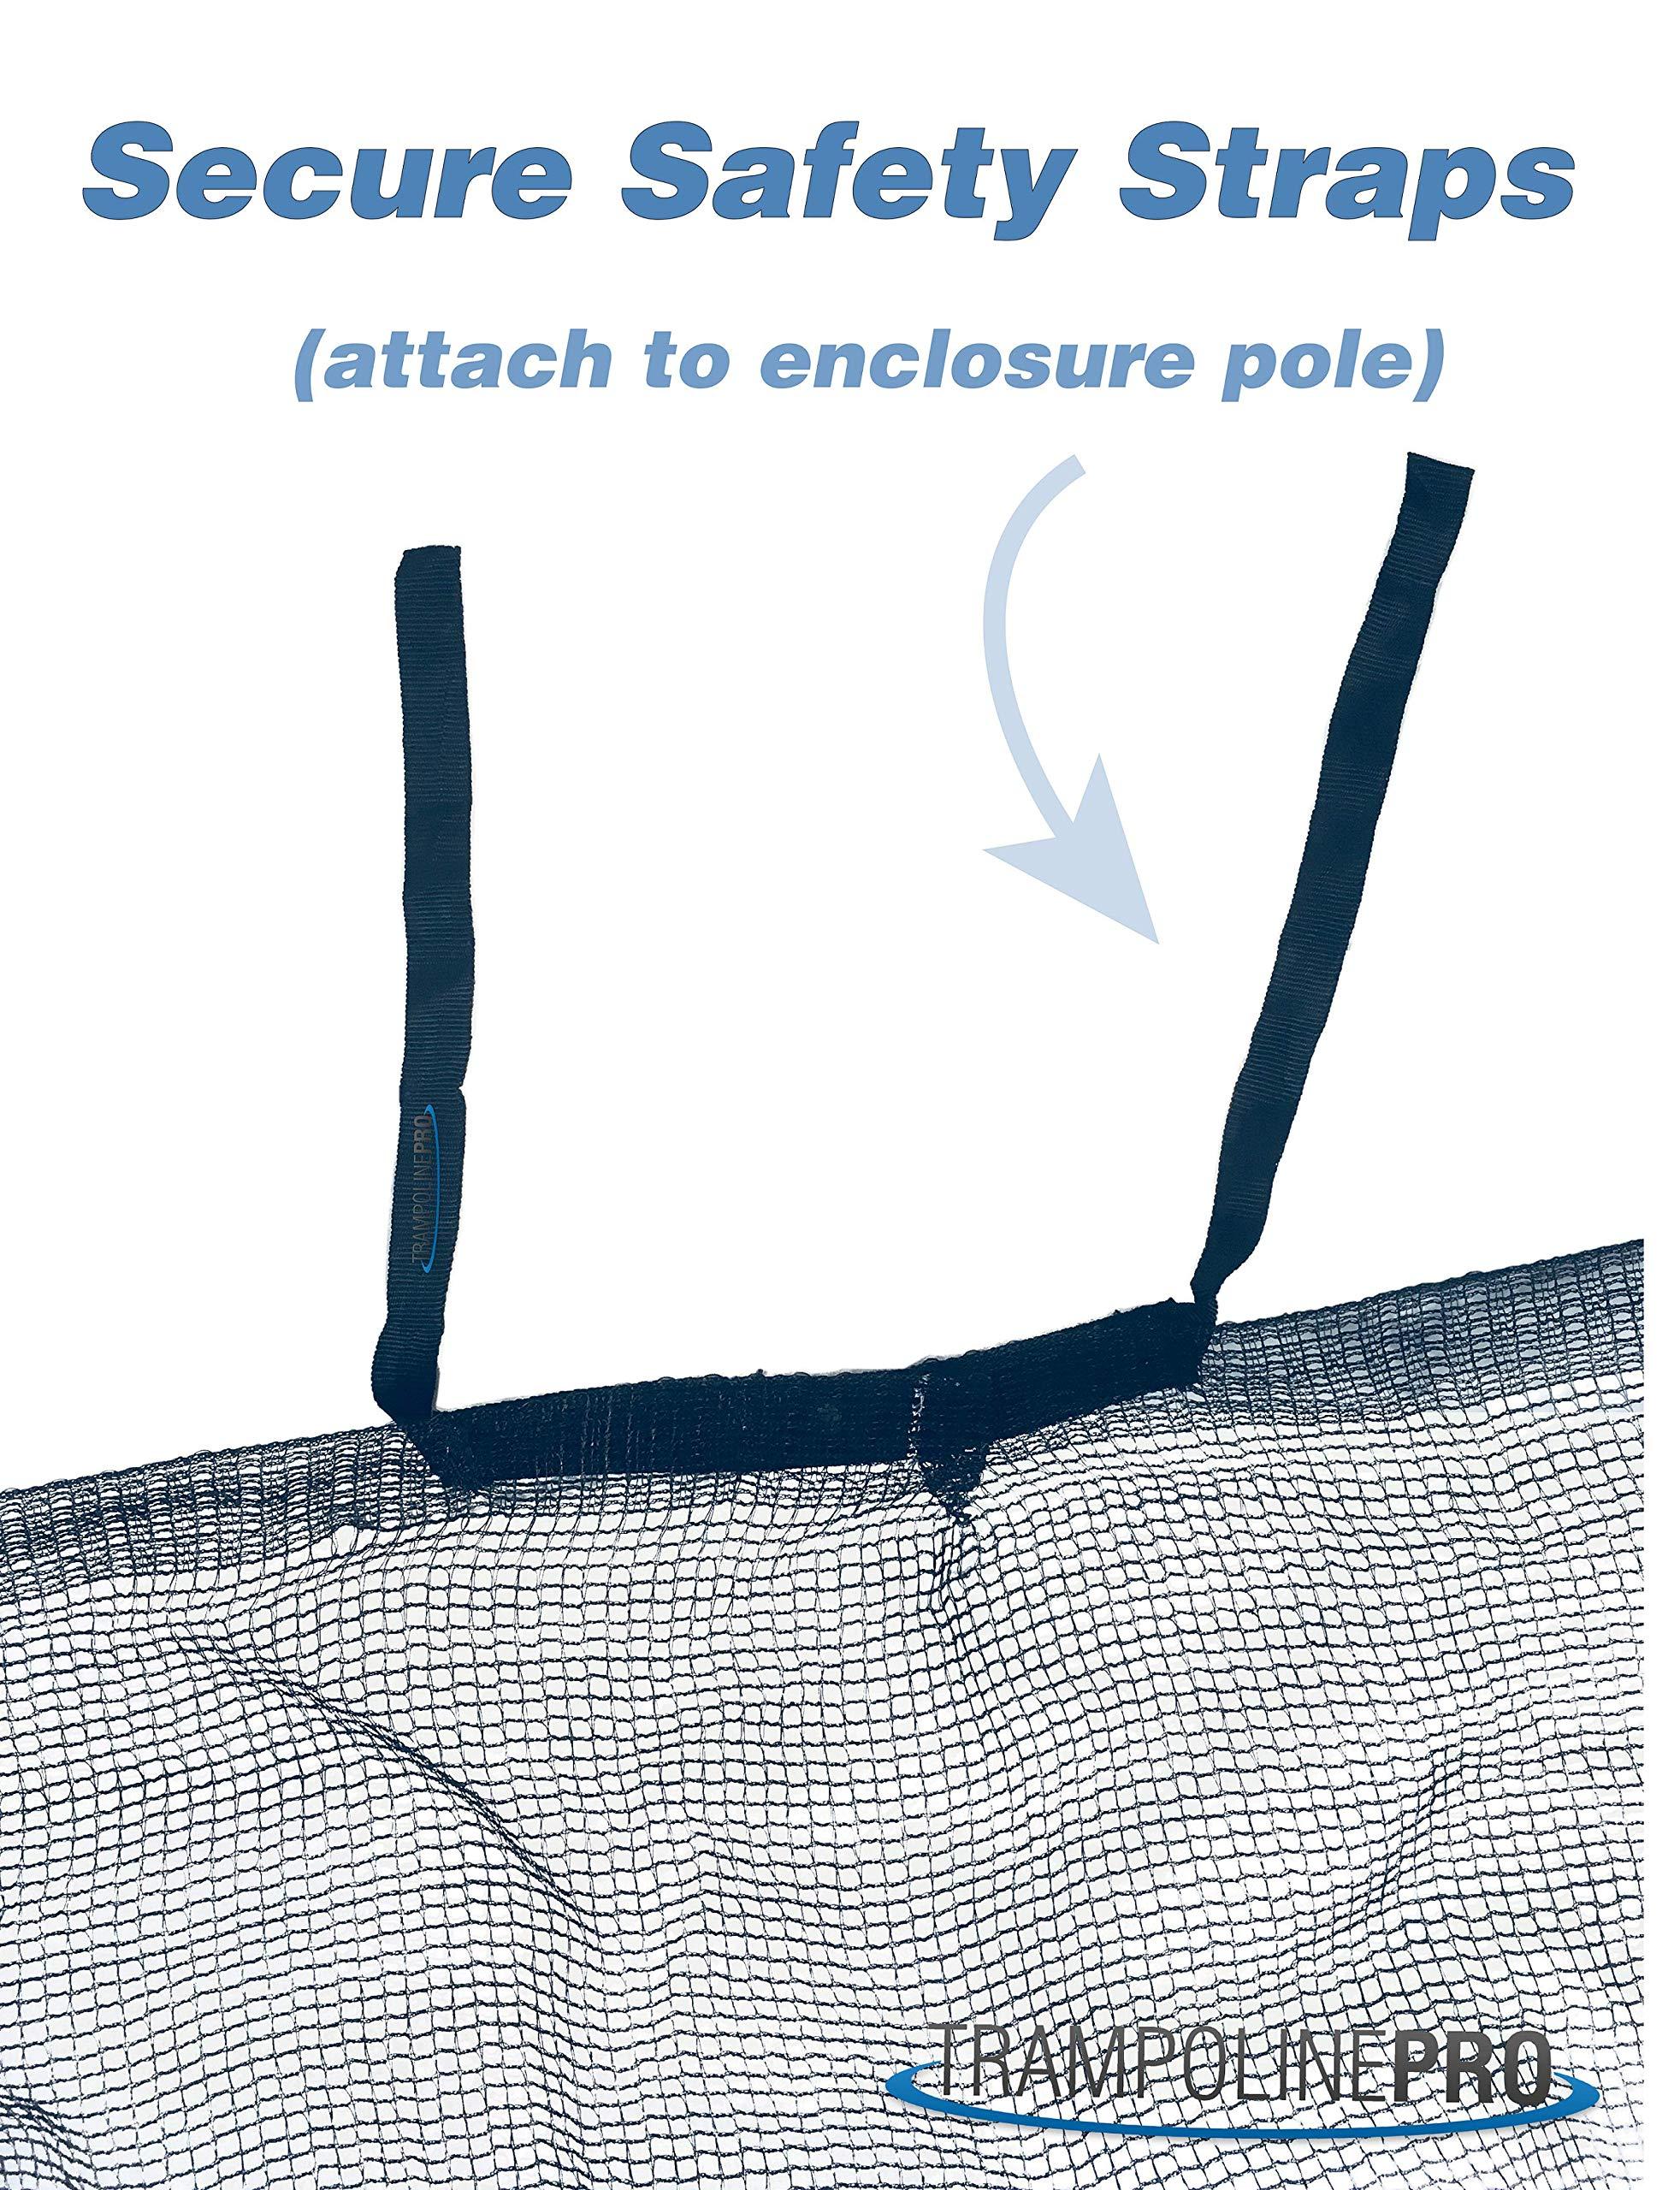 14' Universal Trampoline Enclosure Safety Net by Trampoline Pro (Image #3)